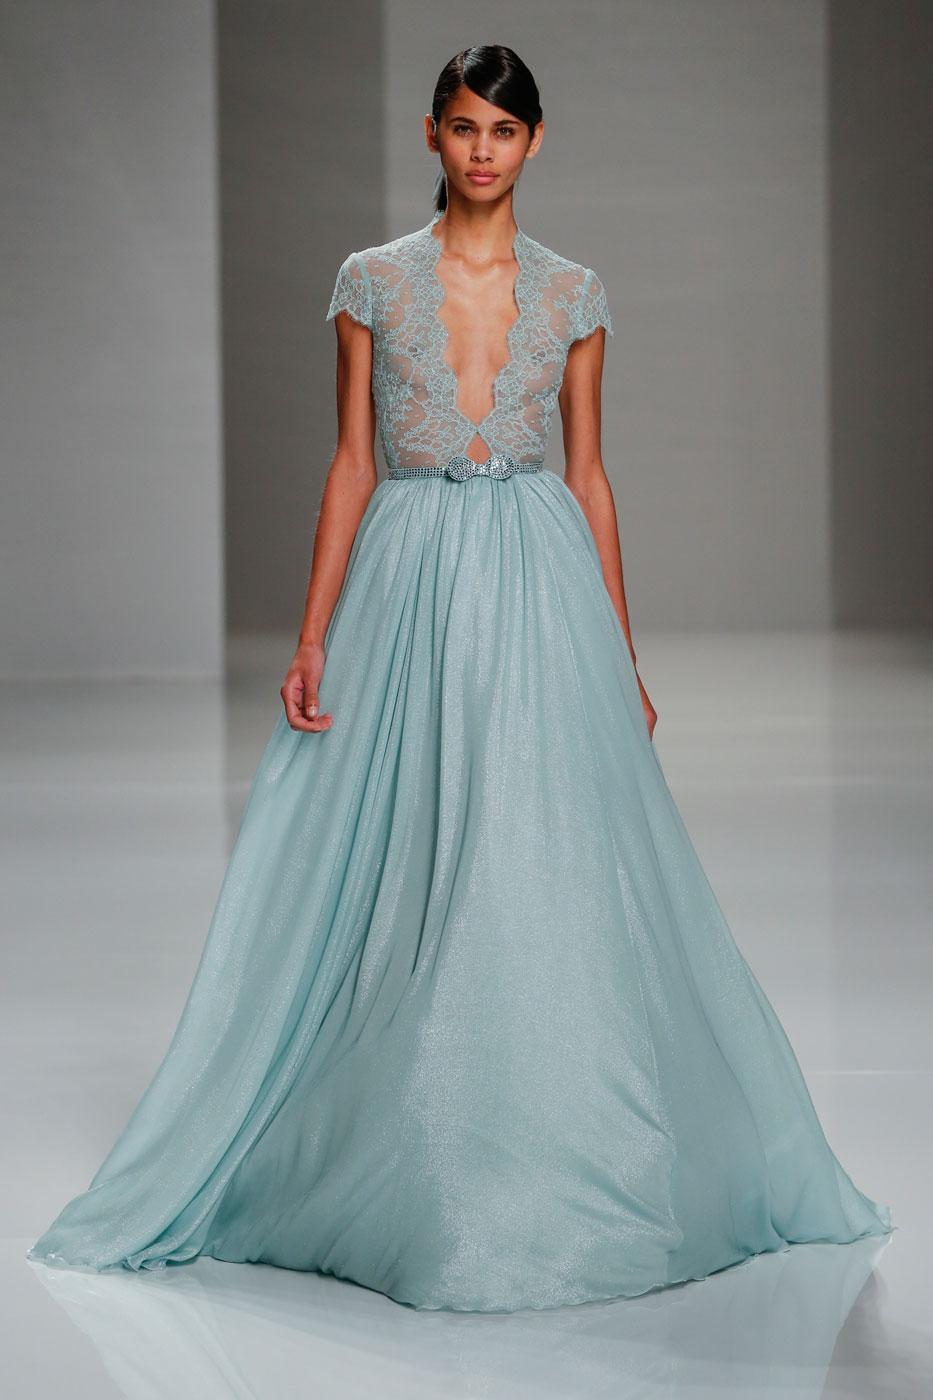 Georges-Hobeika-fashion-runway-show-haute-couture-paris-spring-2015-the-impression-41